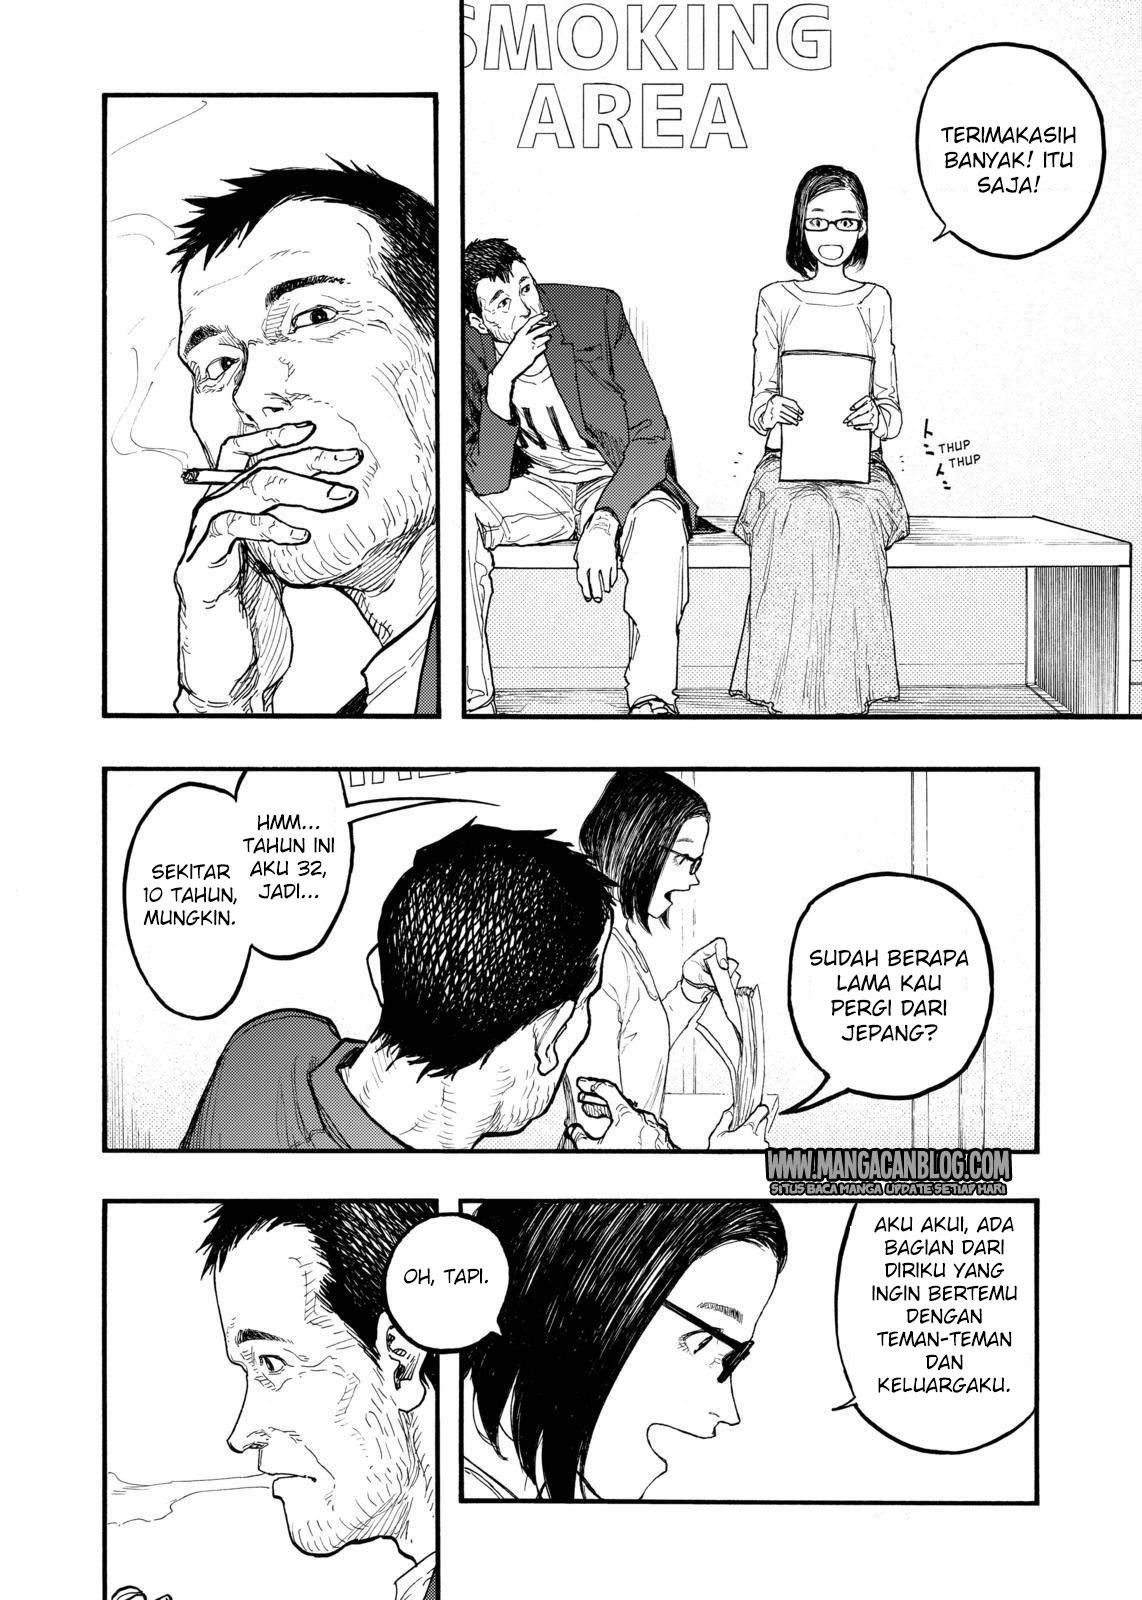 Dilarang COPAS - situs resmi www.mangacanblog.com - Komik ajin 046 - selamat pagi, sampai jumpa besok 47 Indonesia ajin 046 - selamat pagi, sampai jumpa besok Terbaru 30|Baca Manga Komik Indonesia|Mangacan